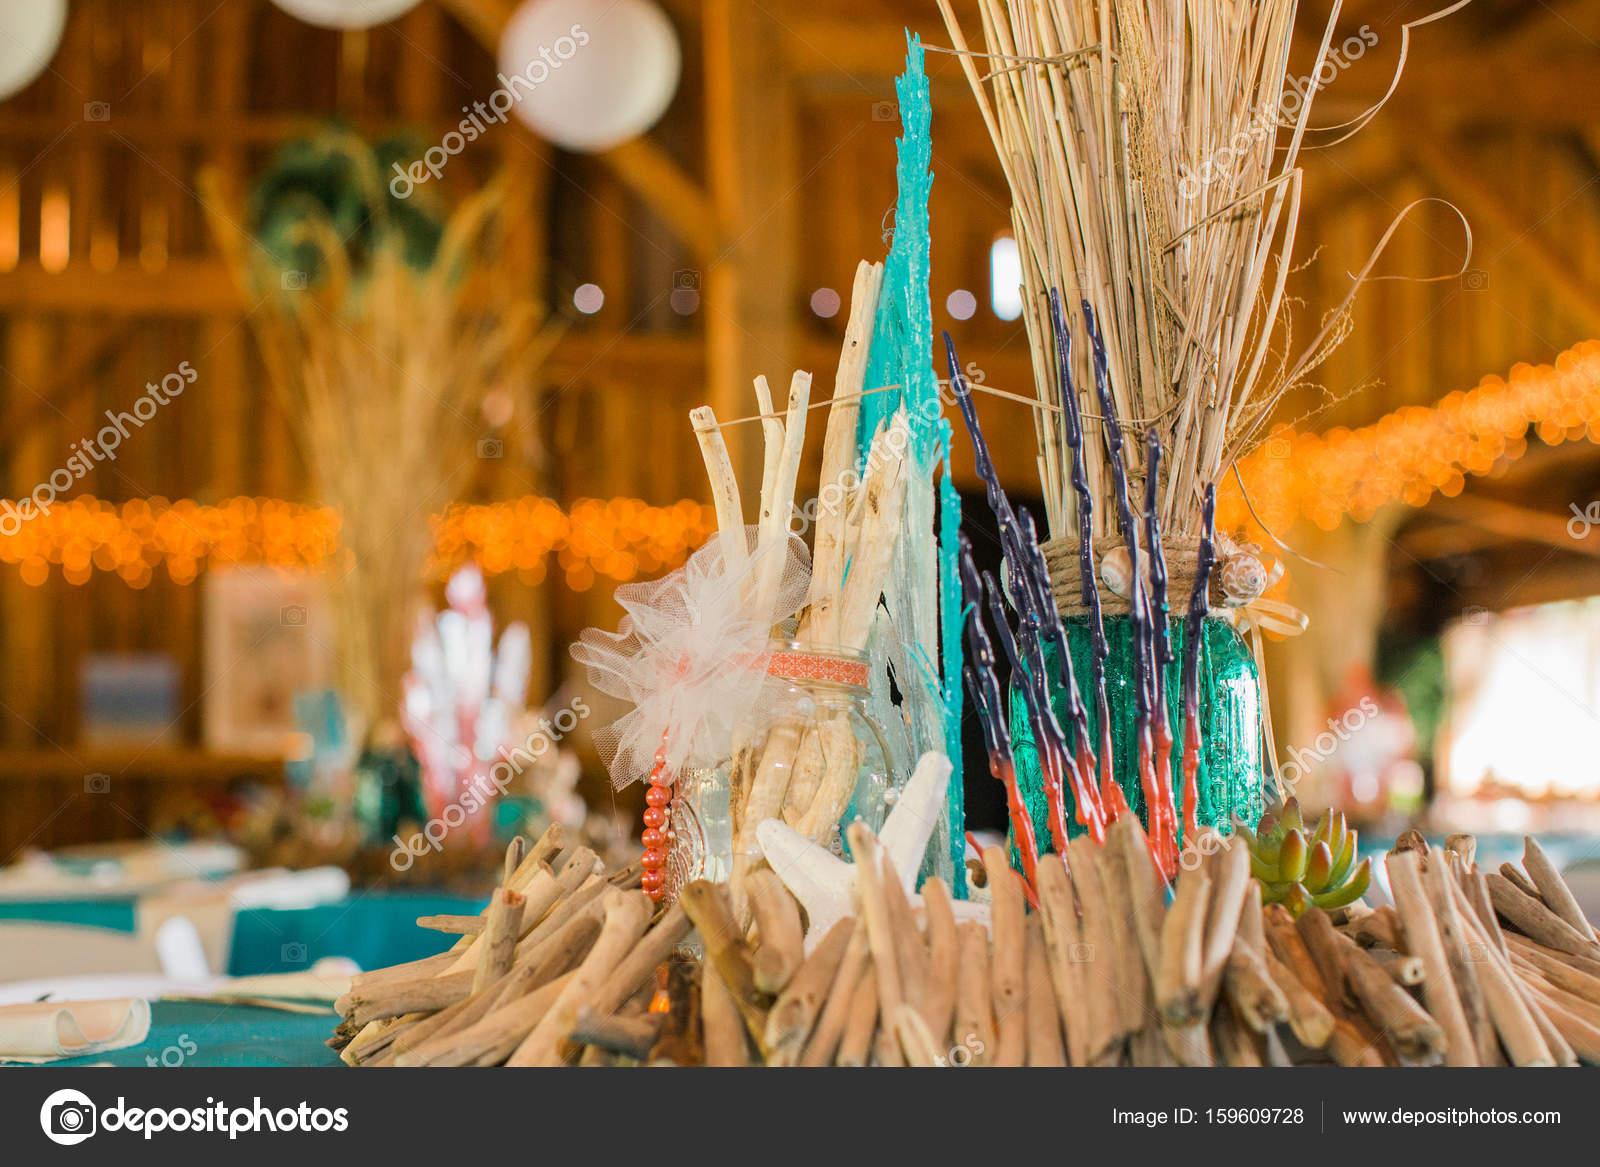 Beach Themed Ocean Wedding Reception Decorations Stock